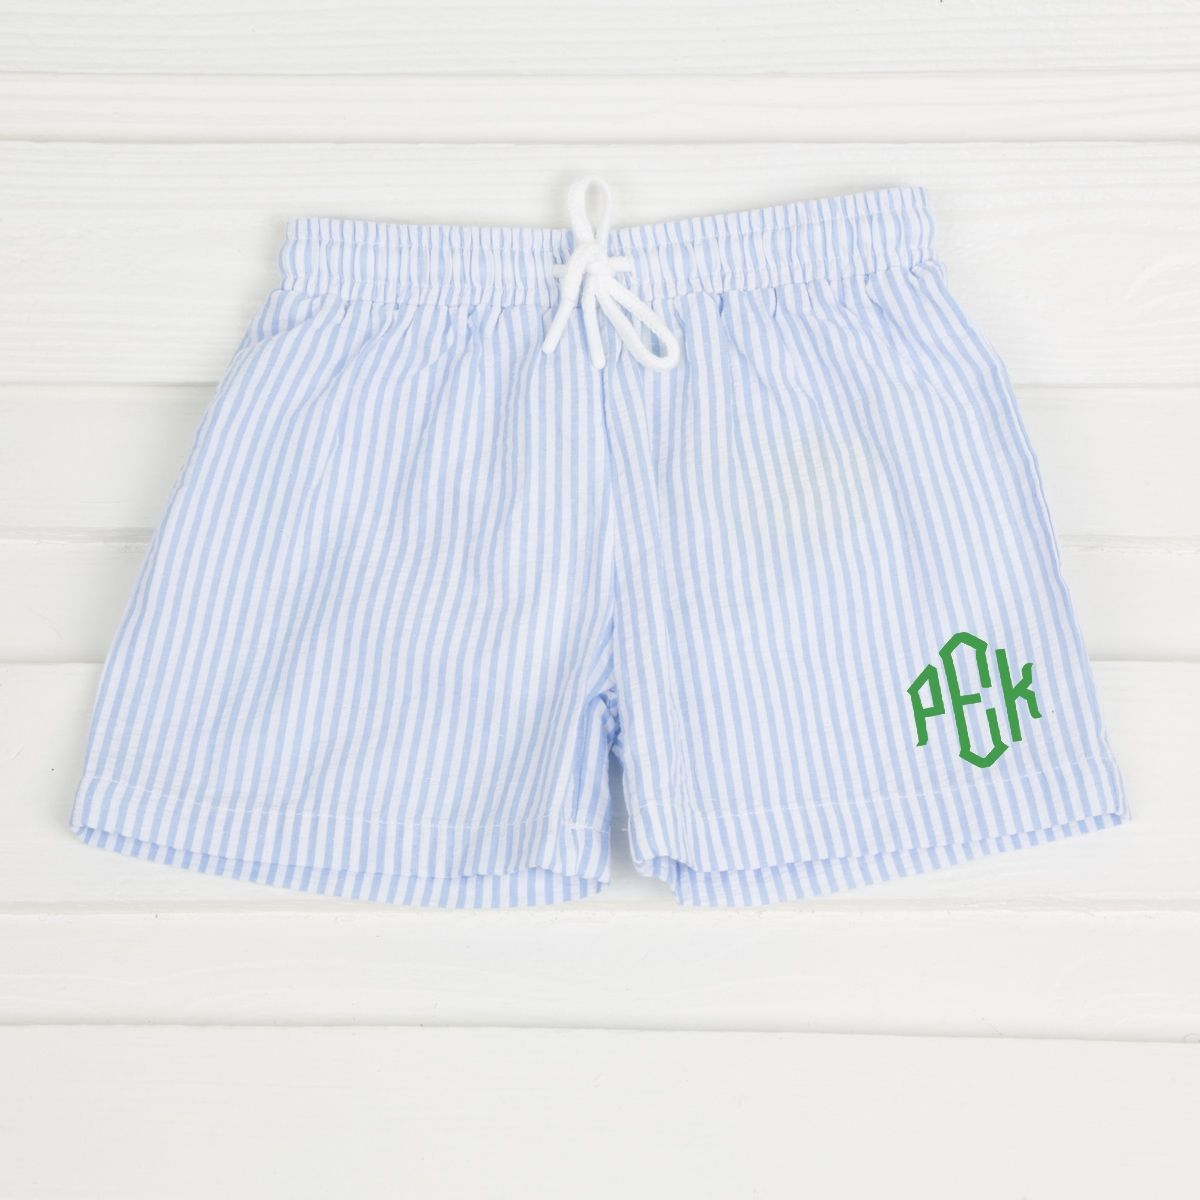 44545f9ee8 This adorable swim trunk is a must this season! Light blue seersucker  stripe fabric. Cotton blend seersucker. *NOT LYCRA* Mesh lined. Tie waist  band.